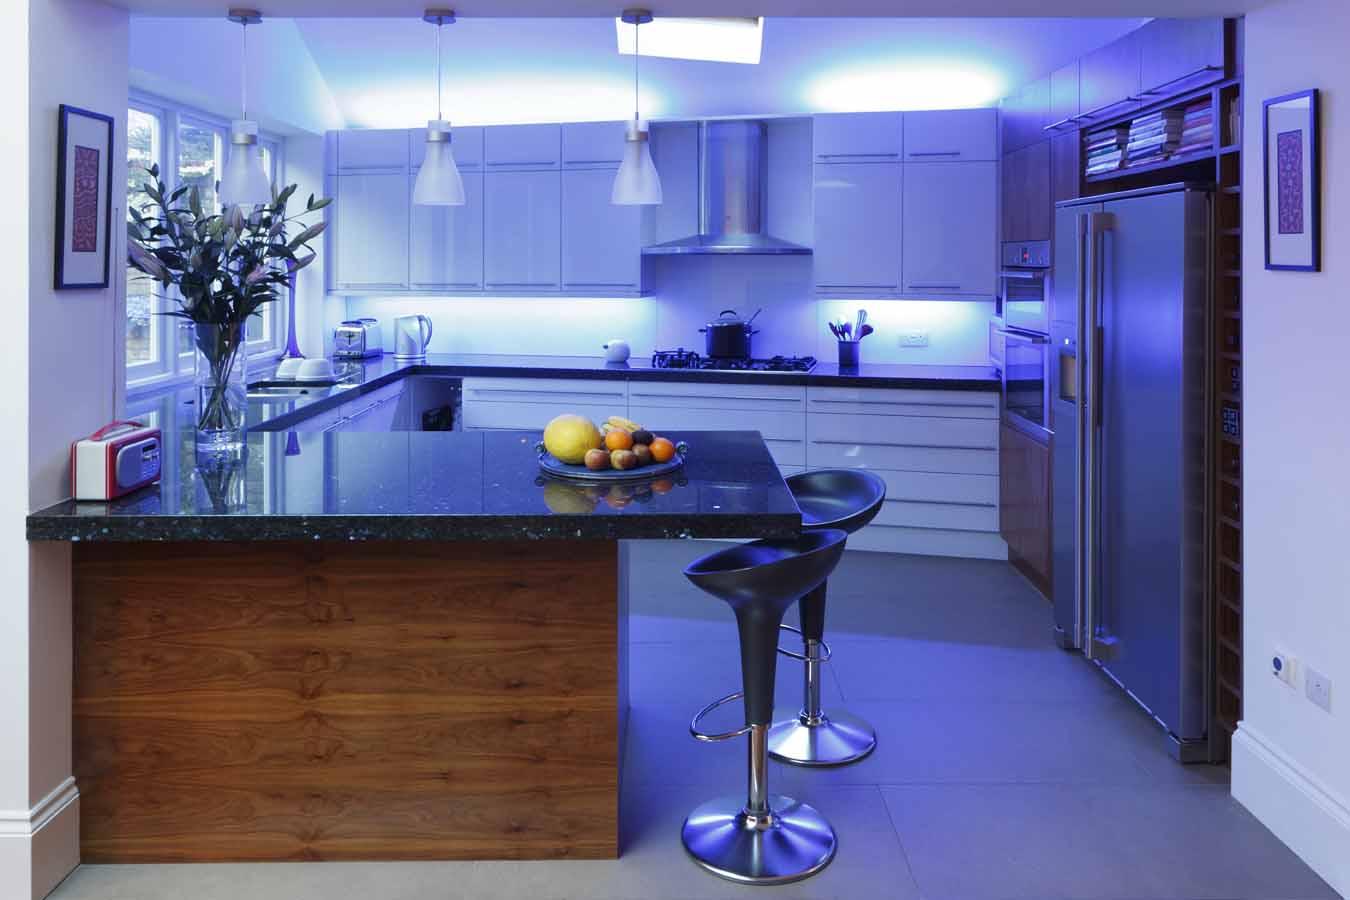 LED Lights For Homes & cogoby: LED Lights For Homes